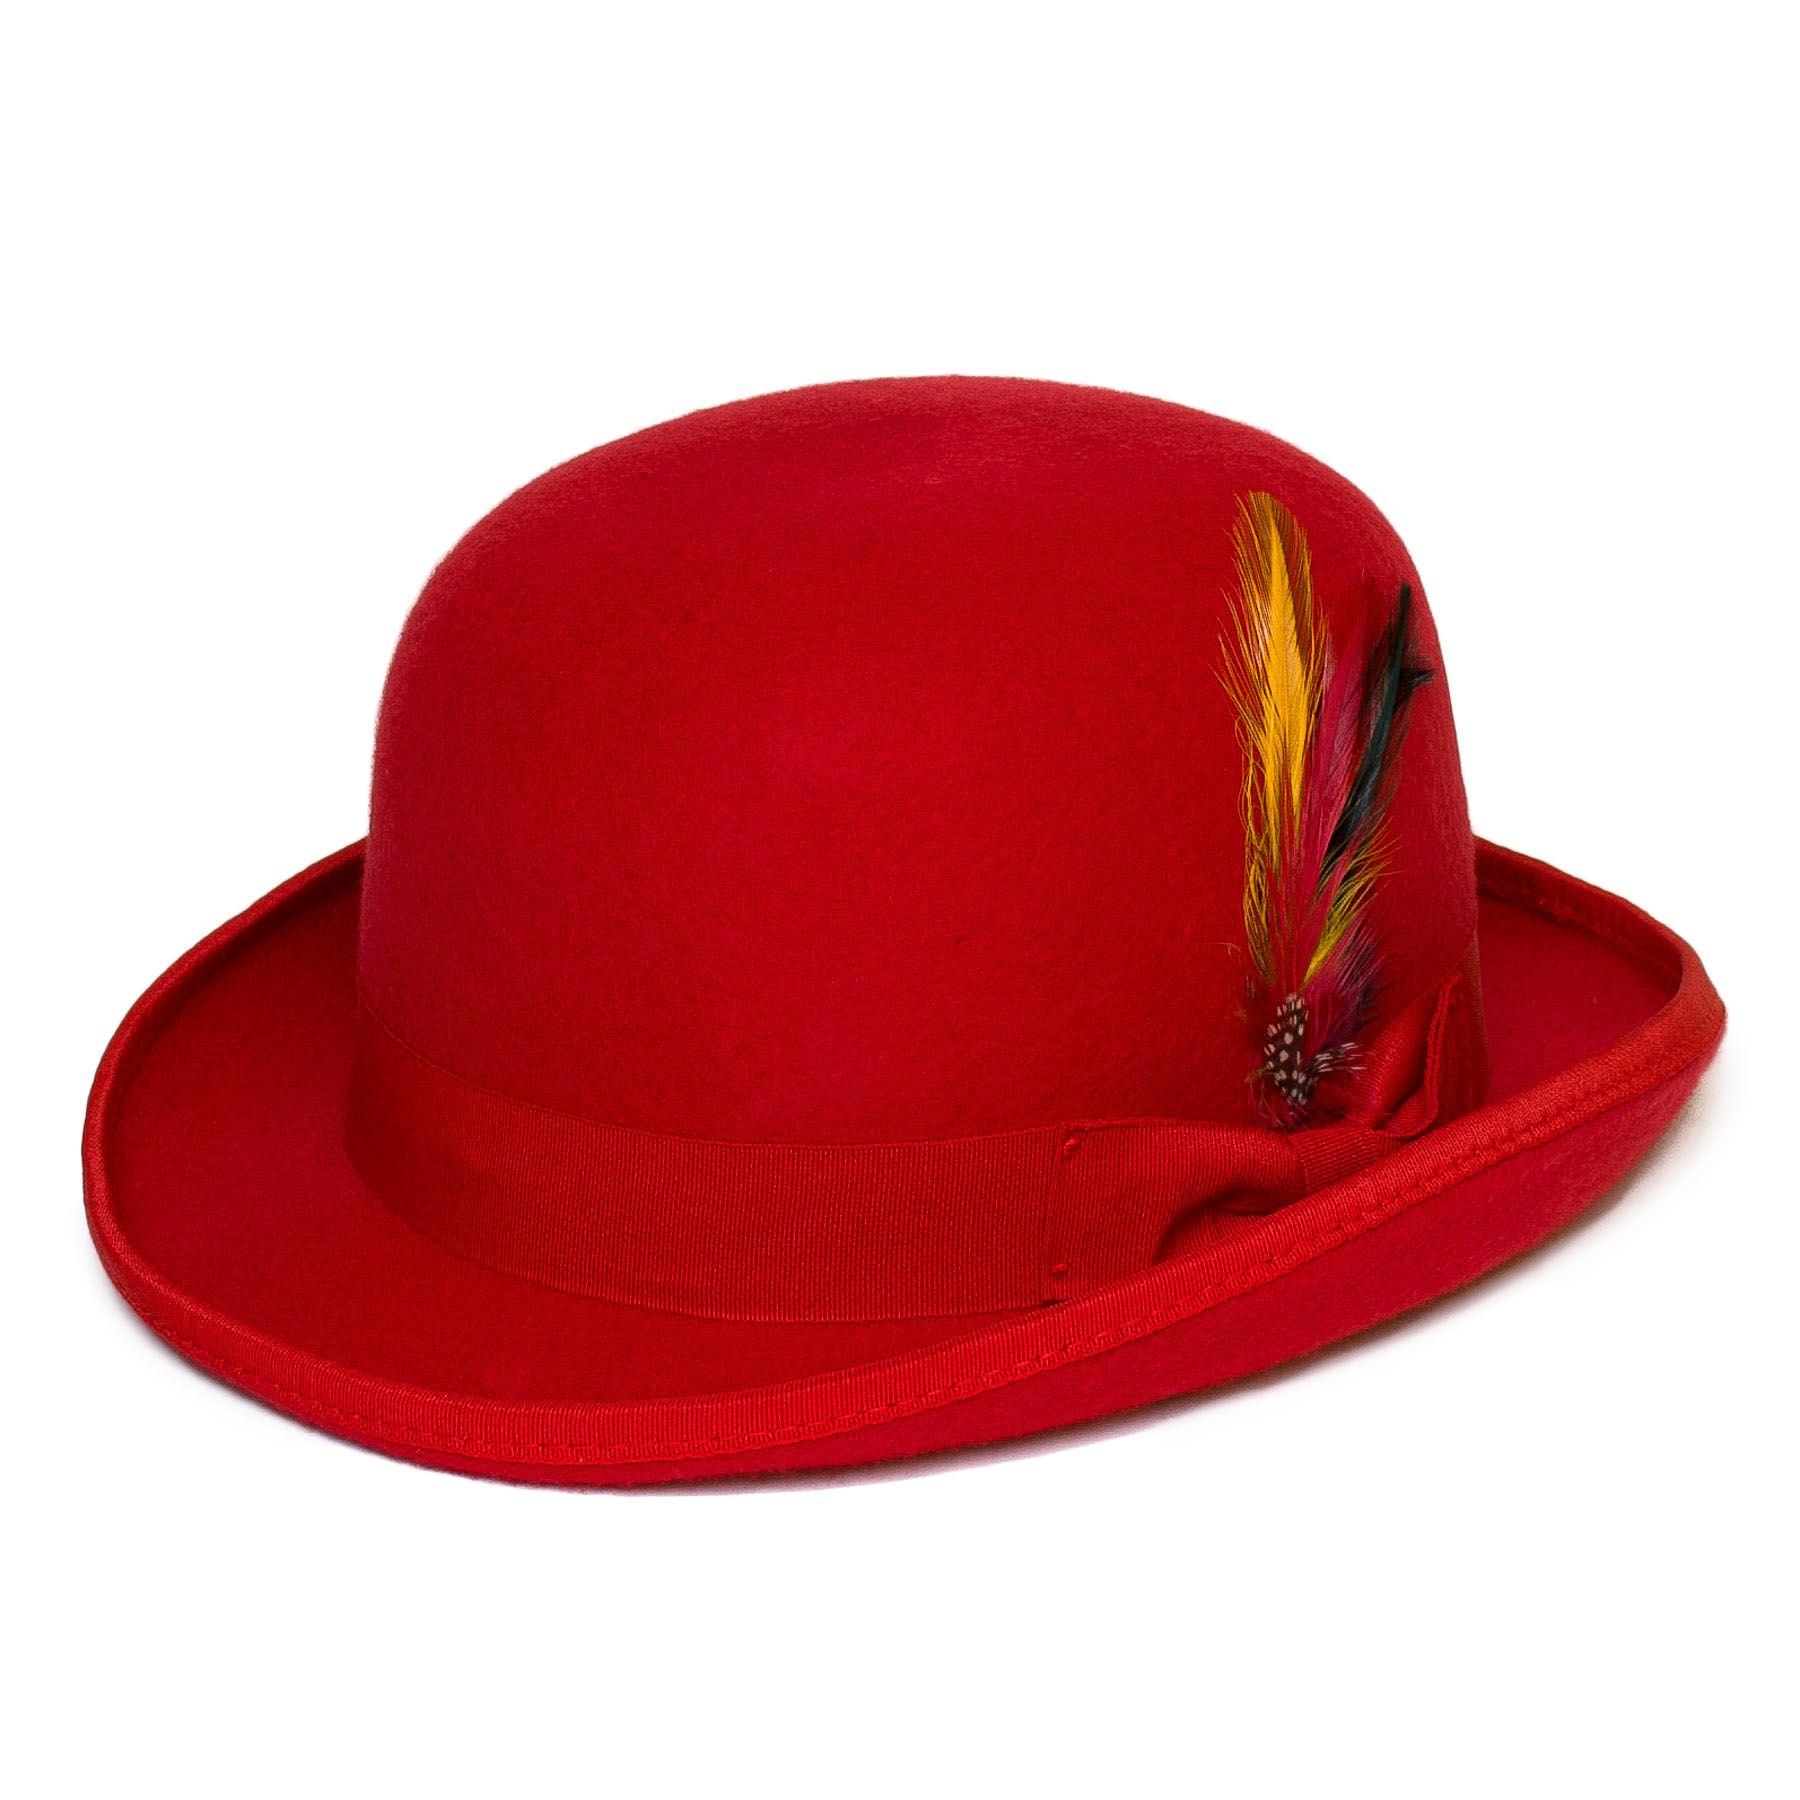 Product Rating for Jaxon Hats Blues Crushable Wool Felt Trilby Fedora Hat. Jaxon Hats Crushable Wool Felt Outback Hat. % Wool Felt. Quick View for Jaxon Hats Crushable Wool Felt Outback Hat. Price: $ Available Colors: Crushable Wool Felt Outback Hat in tan. Crushable Wool Felt Outback Hat .